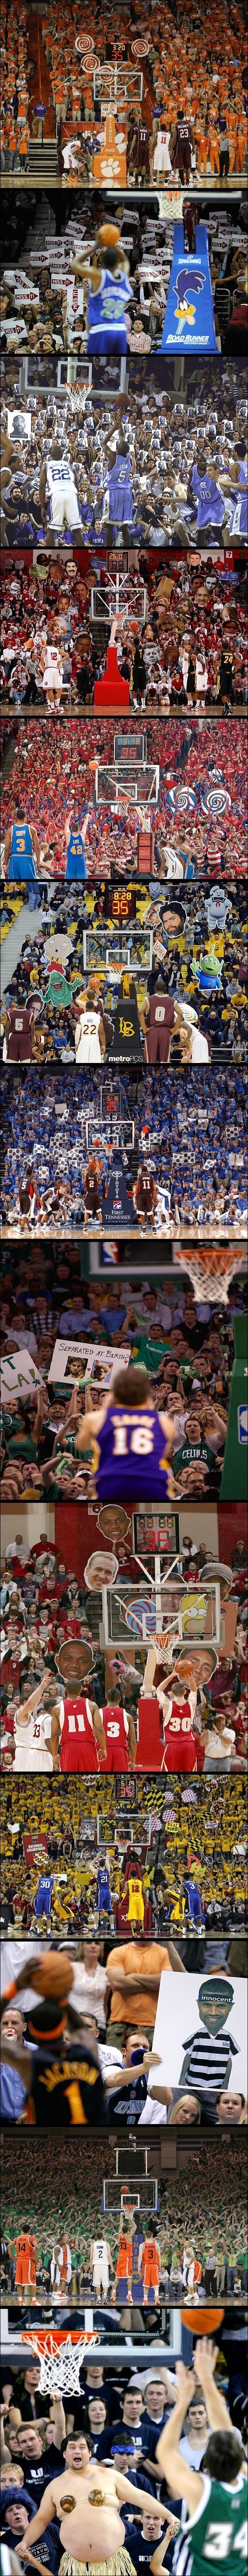 basket NBA defense diversion lancer franc free throw public deconcentration